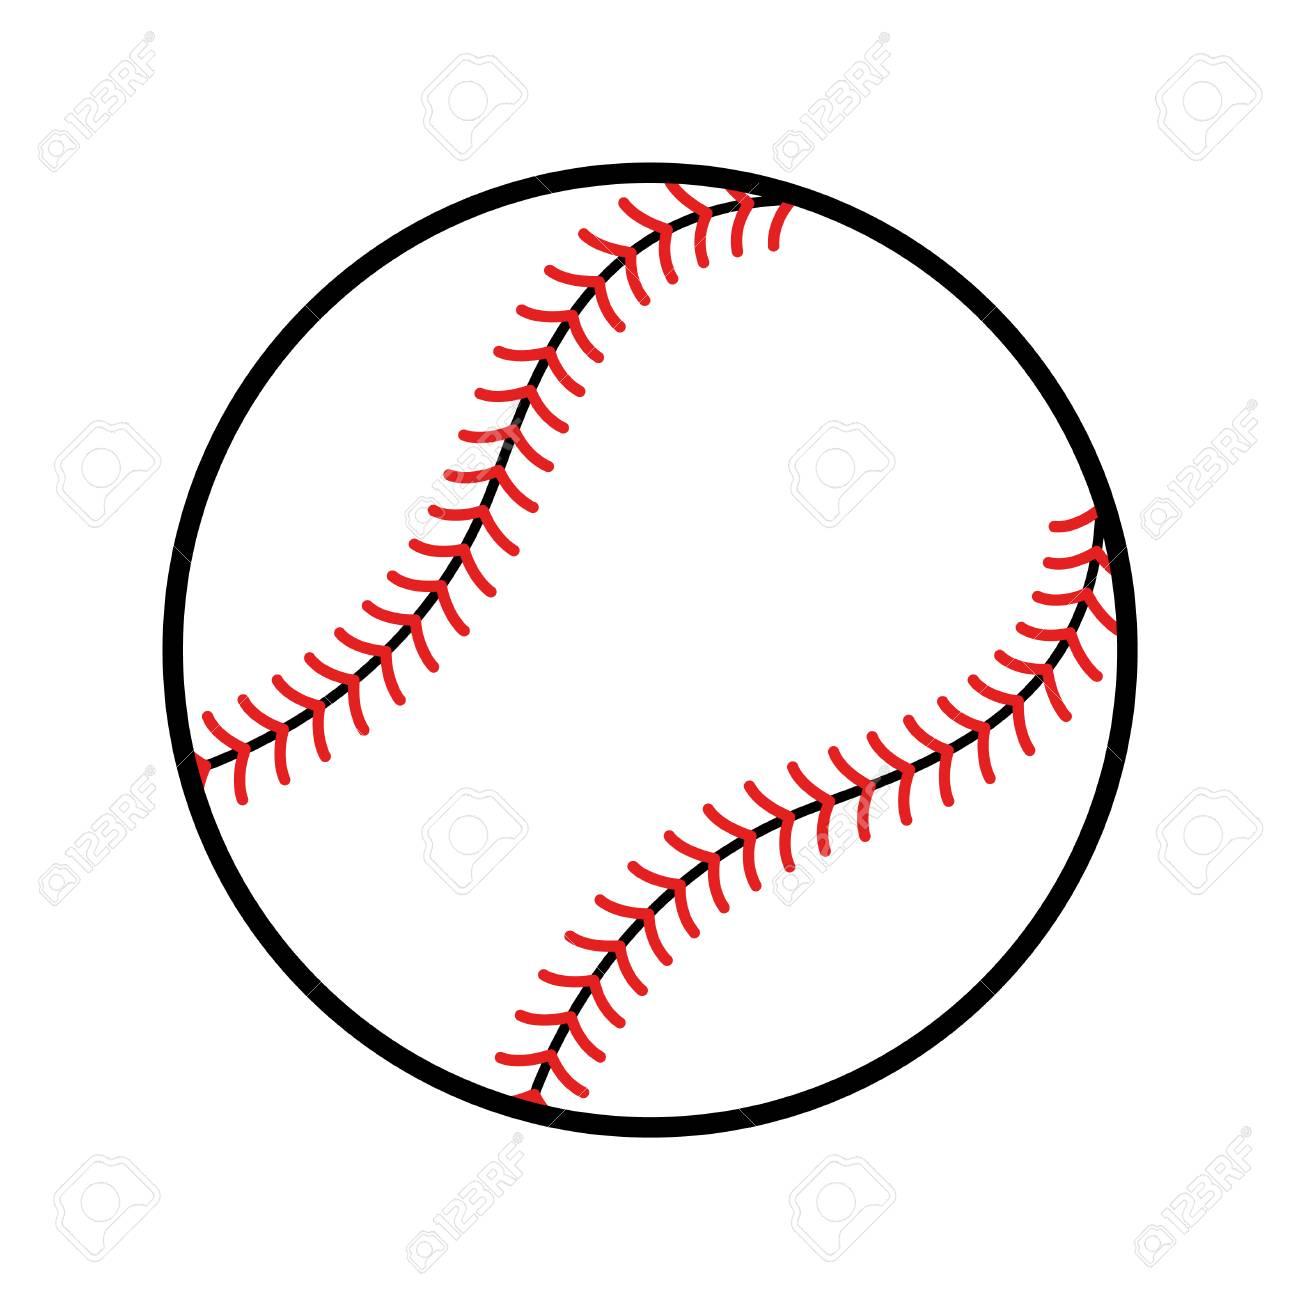 baseball vector icon royalty free cliparts vectors and stock rh 123rf com baseball vector art baseball vector art